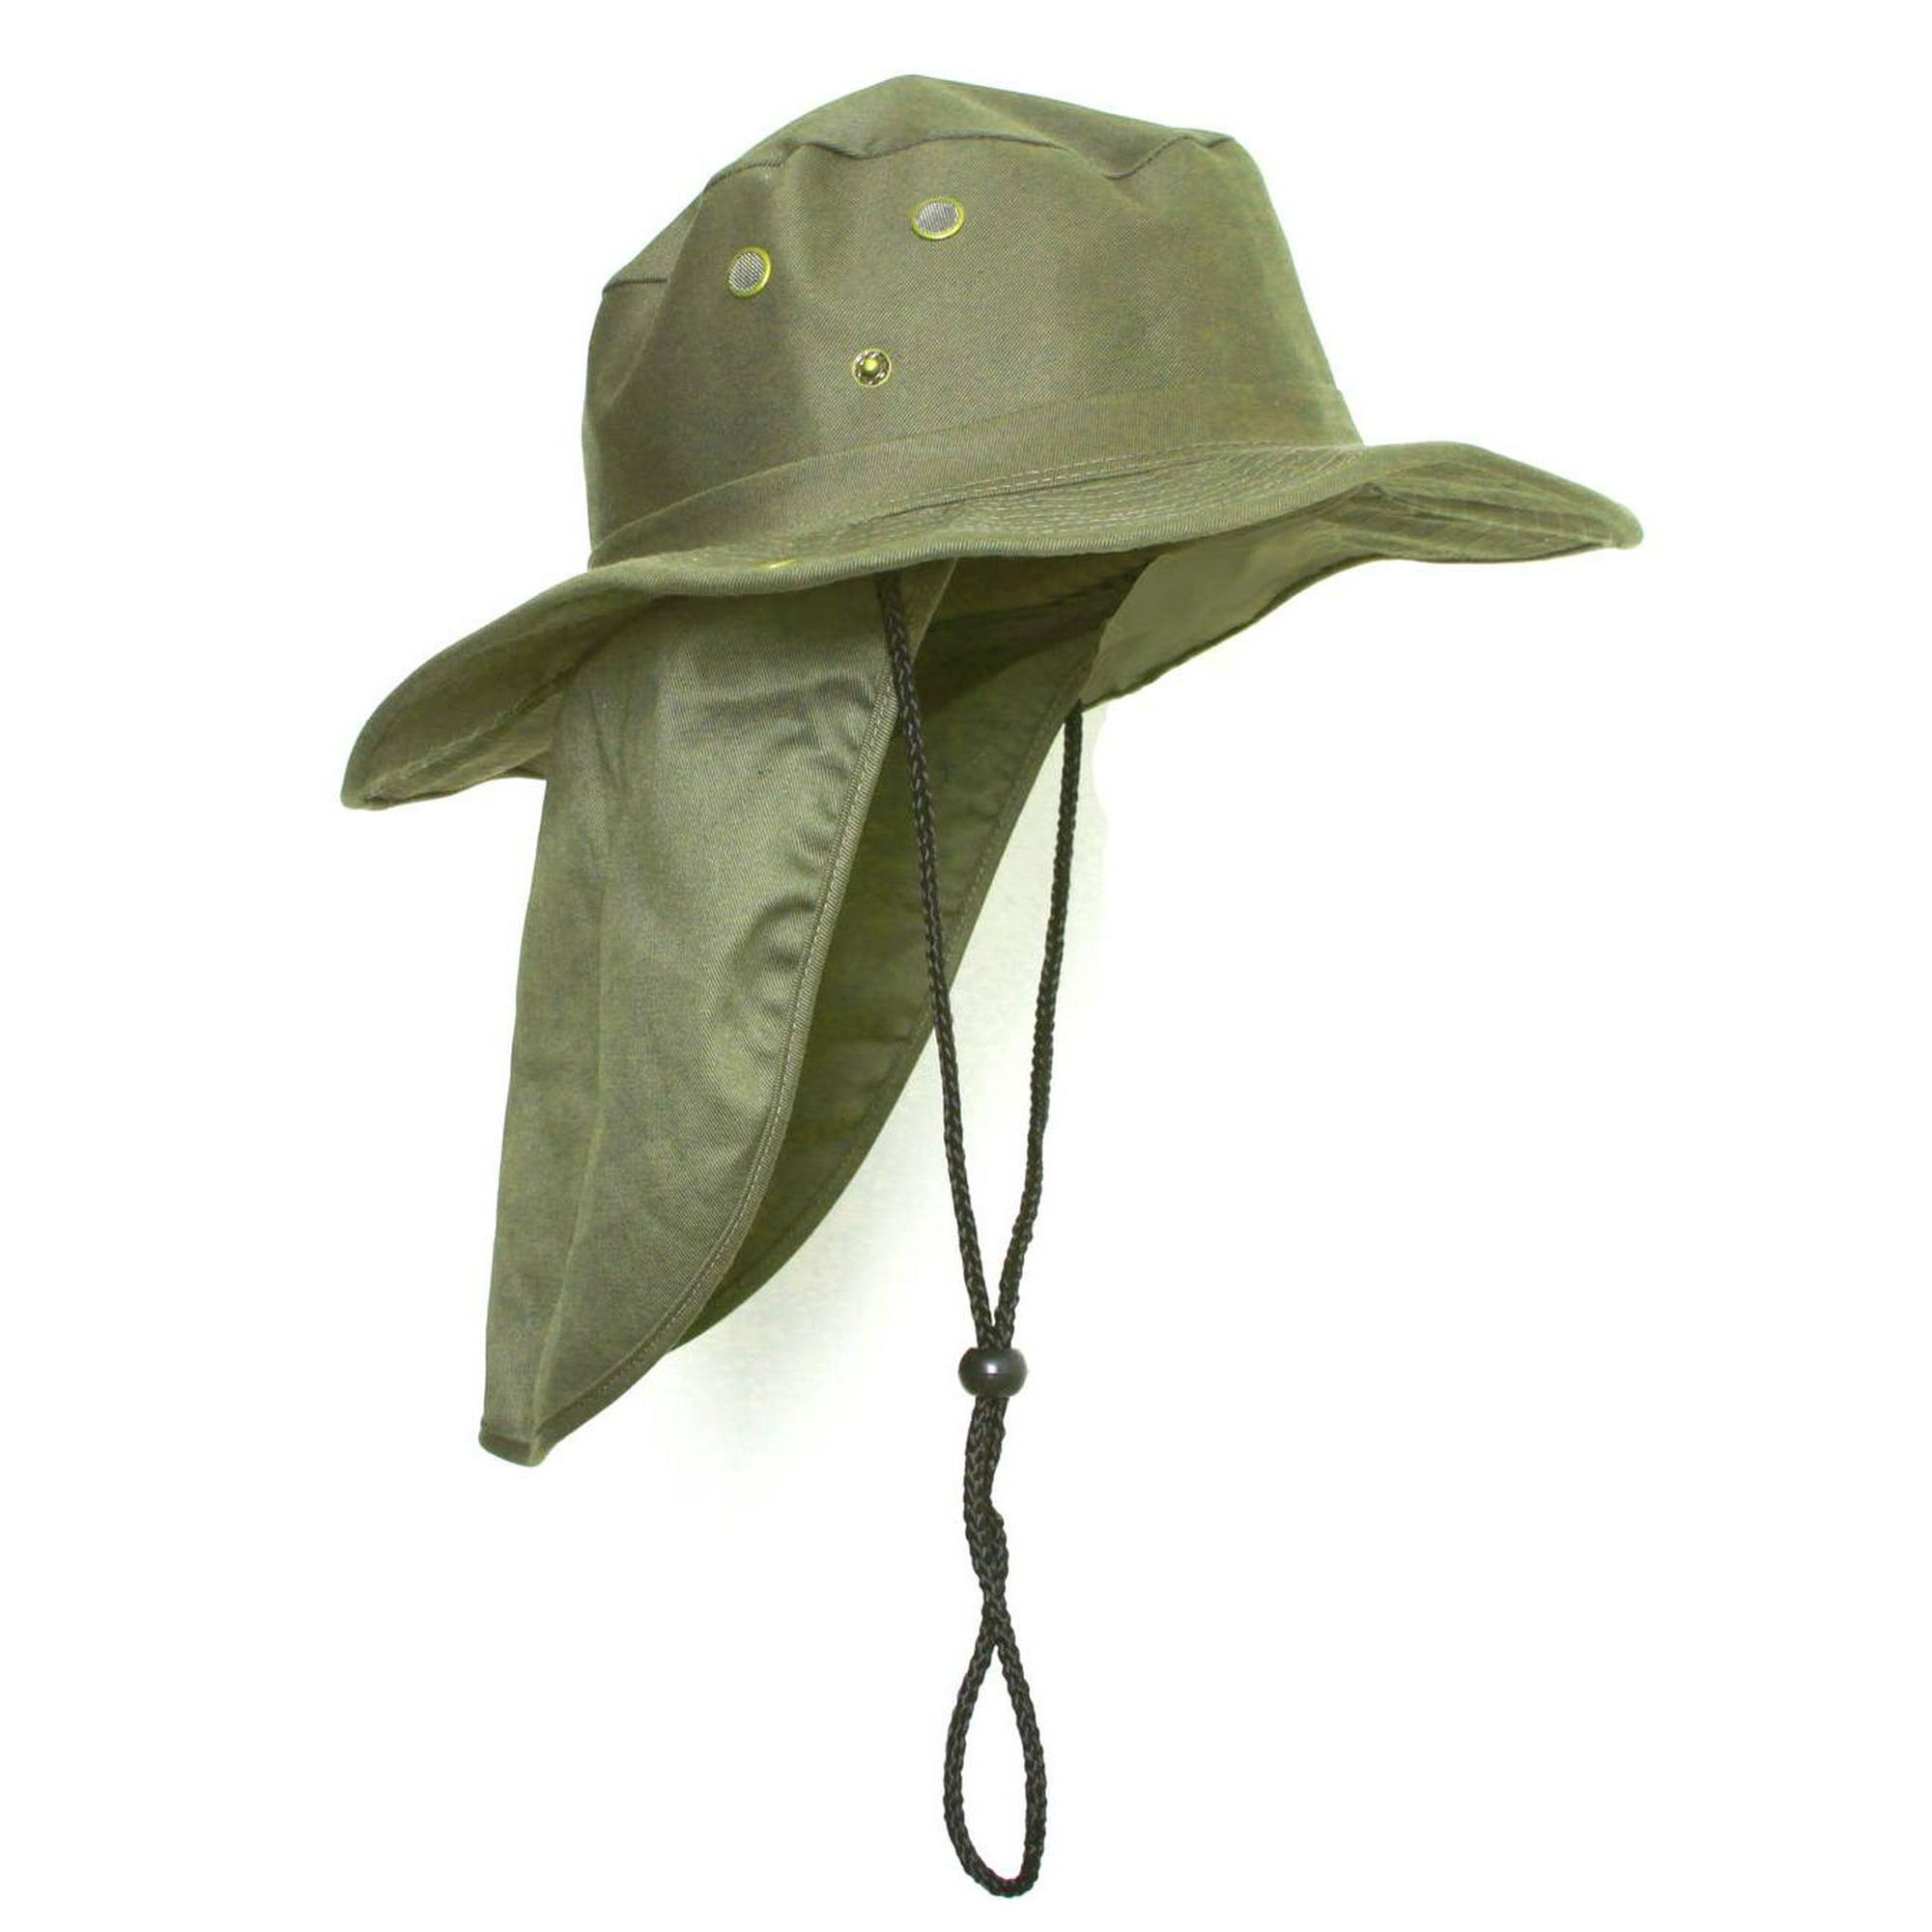 93ca02cc9 Top Headwear Safari Explorer Bucket Hat With Flap Neck Cover - Olive, Medium